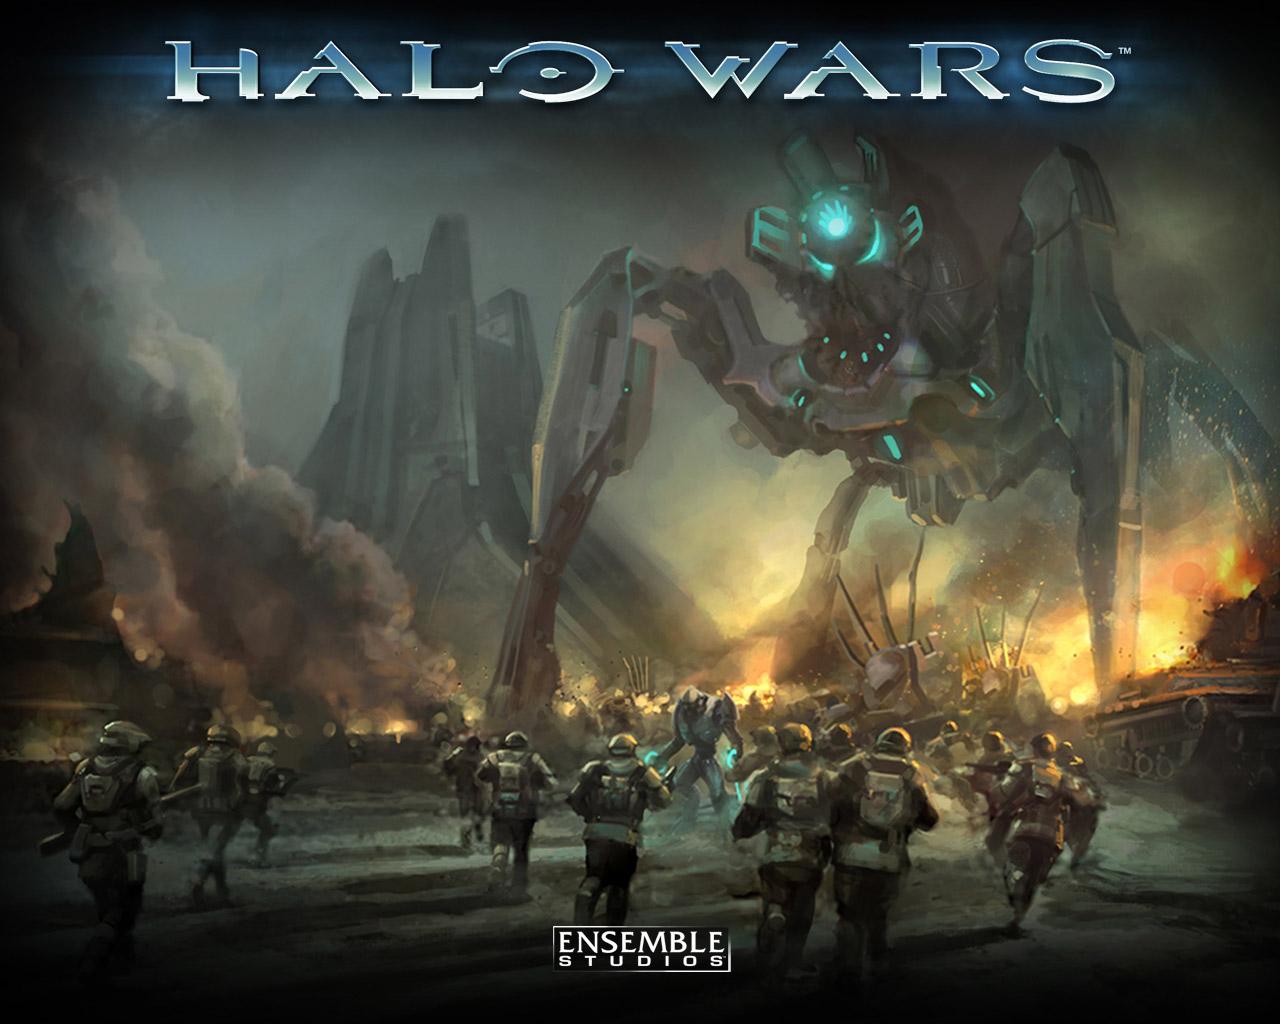 Halo Wars Elite Wallpaper Halo Wars Elite Wallpaper 4390 1280x1024